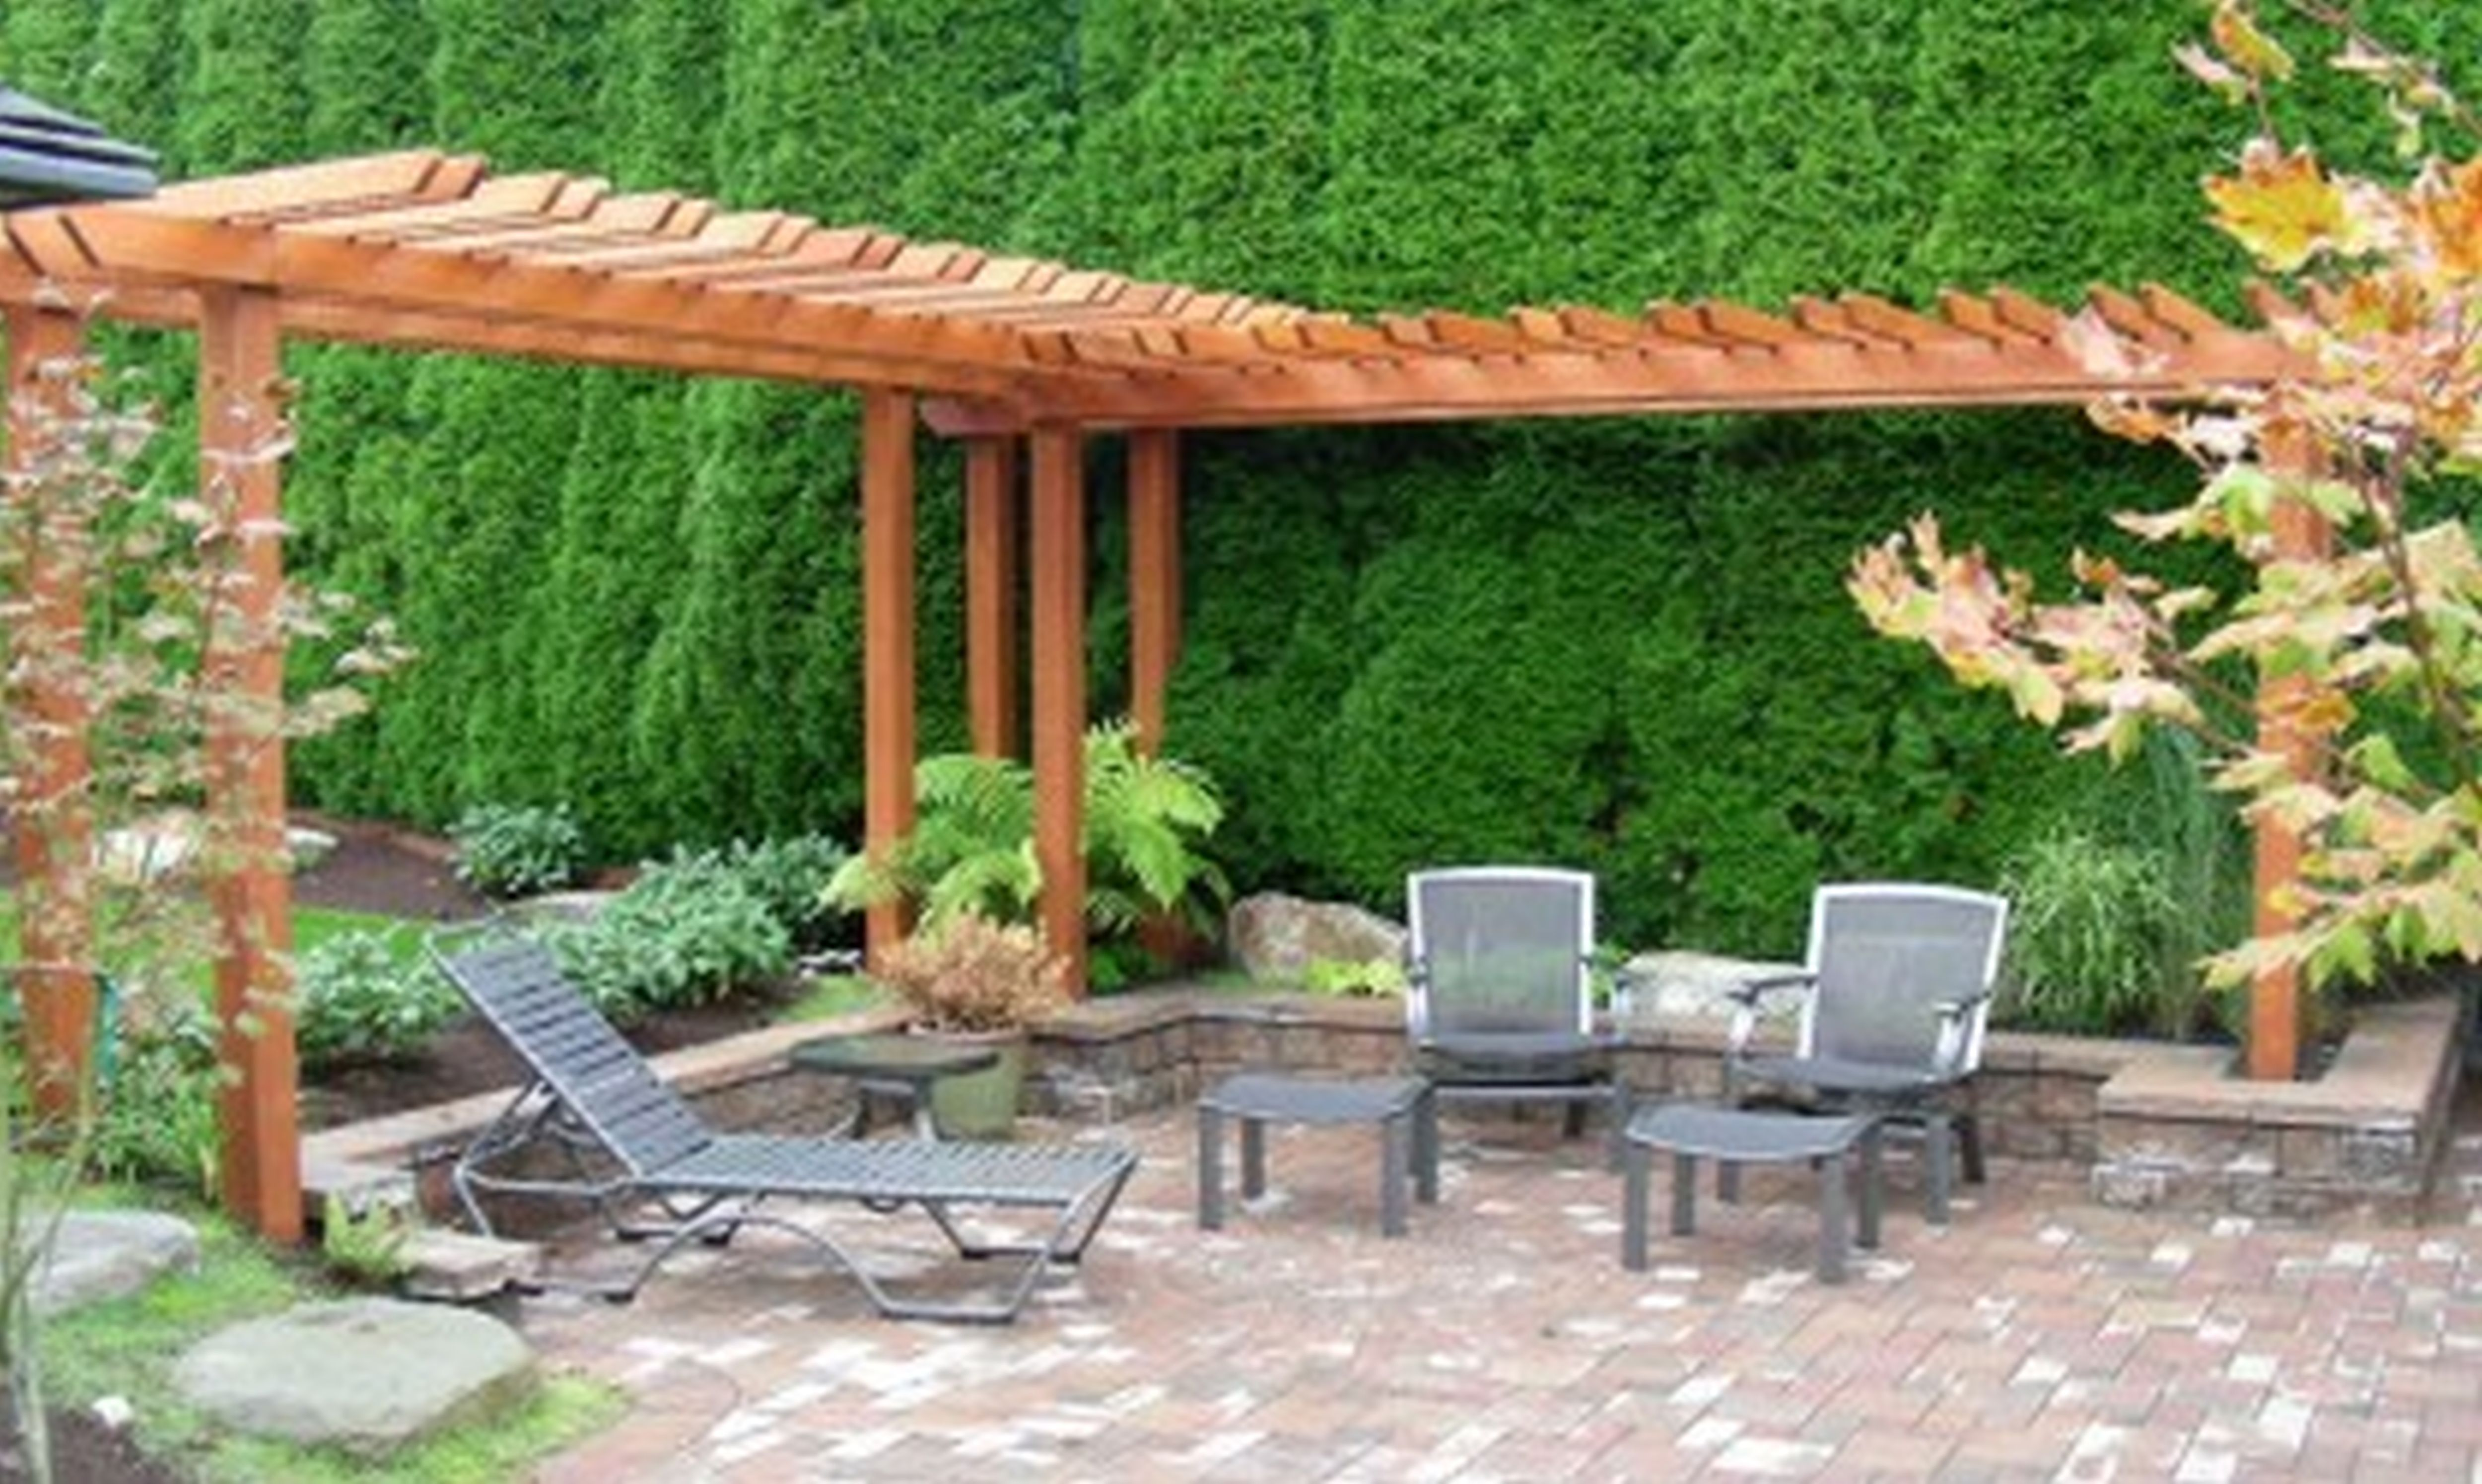 Diy Small Patio Decorating Ideas Modern Patio & Outdoor